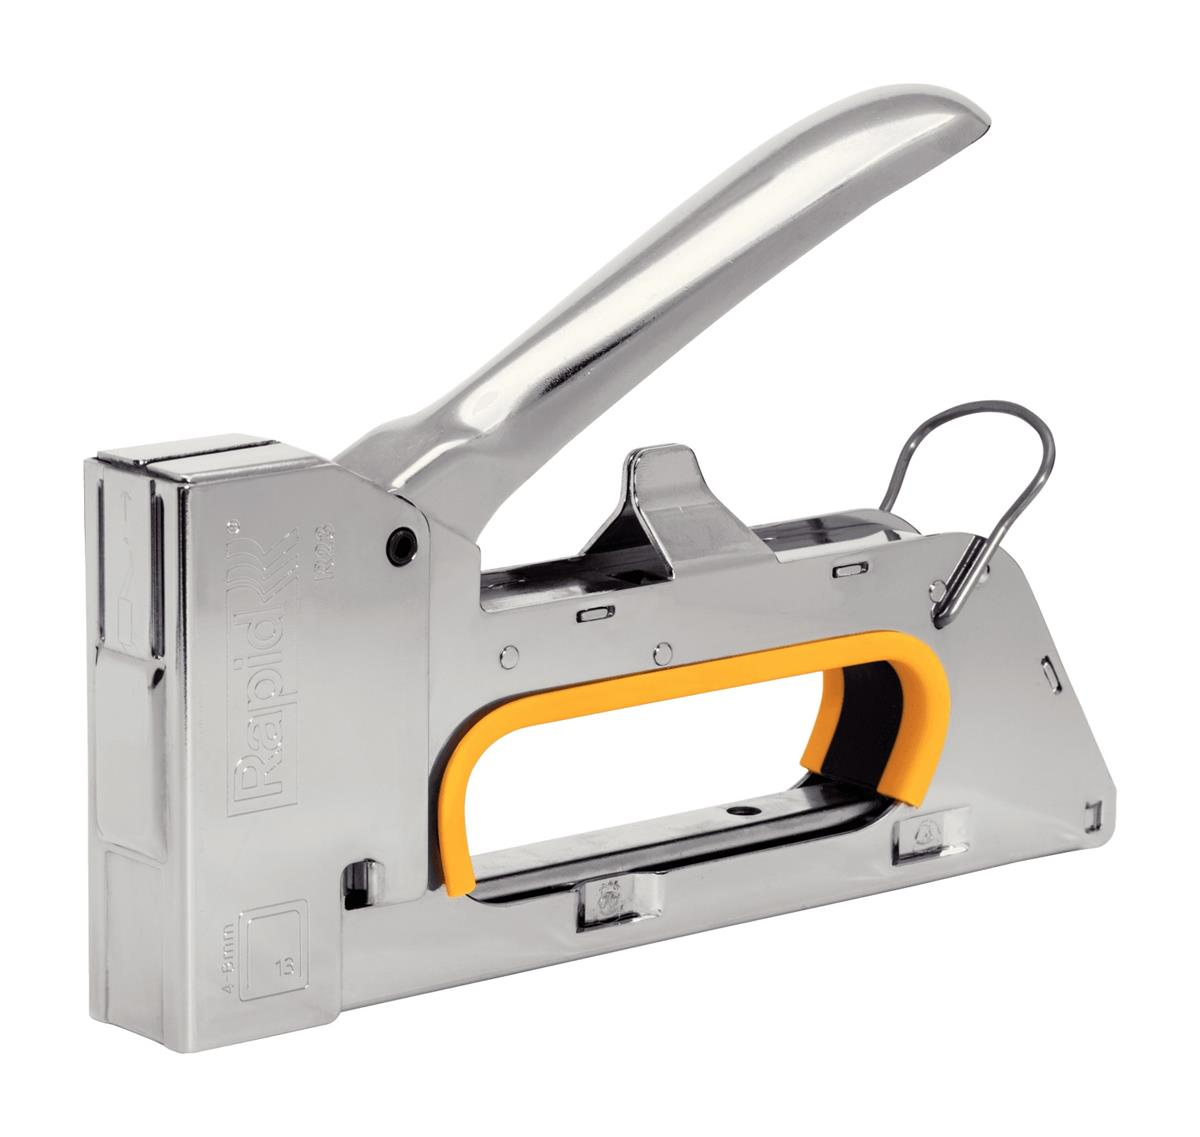 Image for Rapid R23 Heady Duty Staple Gun Metal Ref 10600521